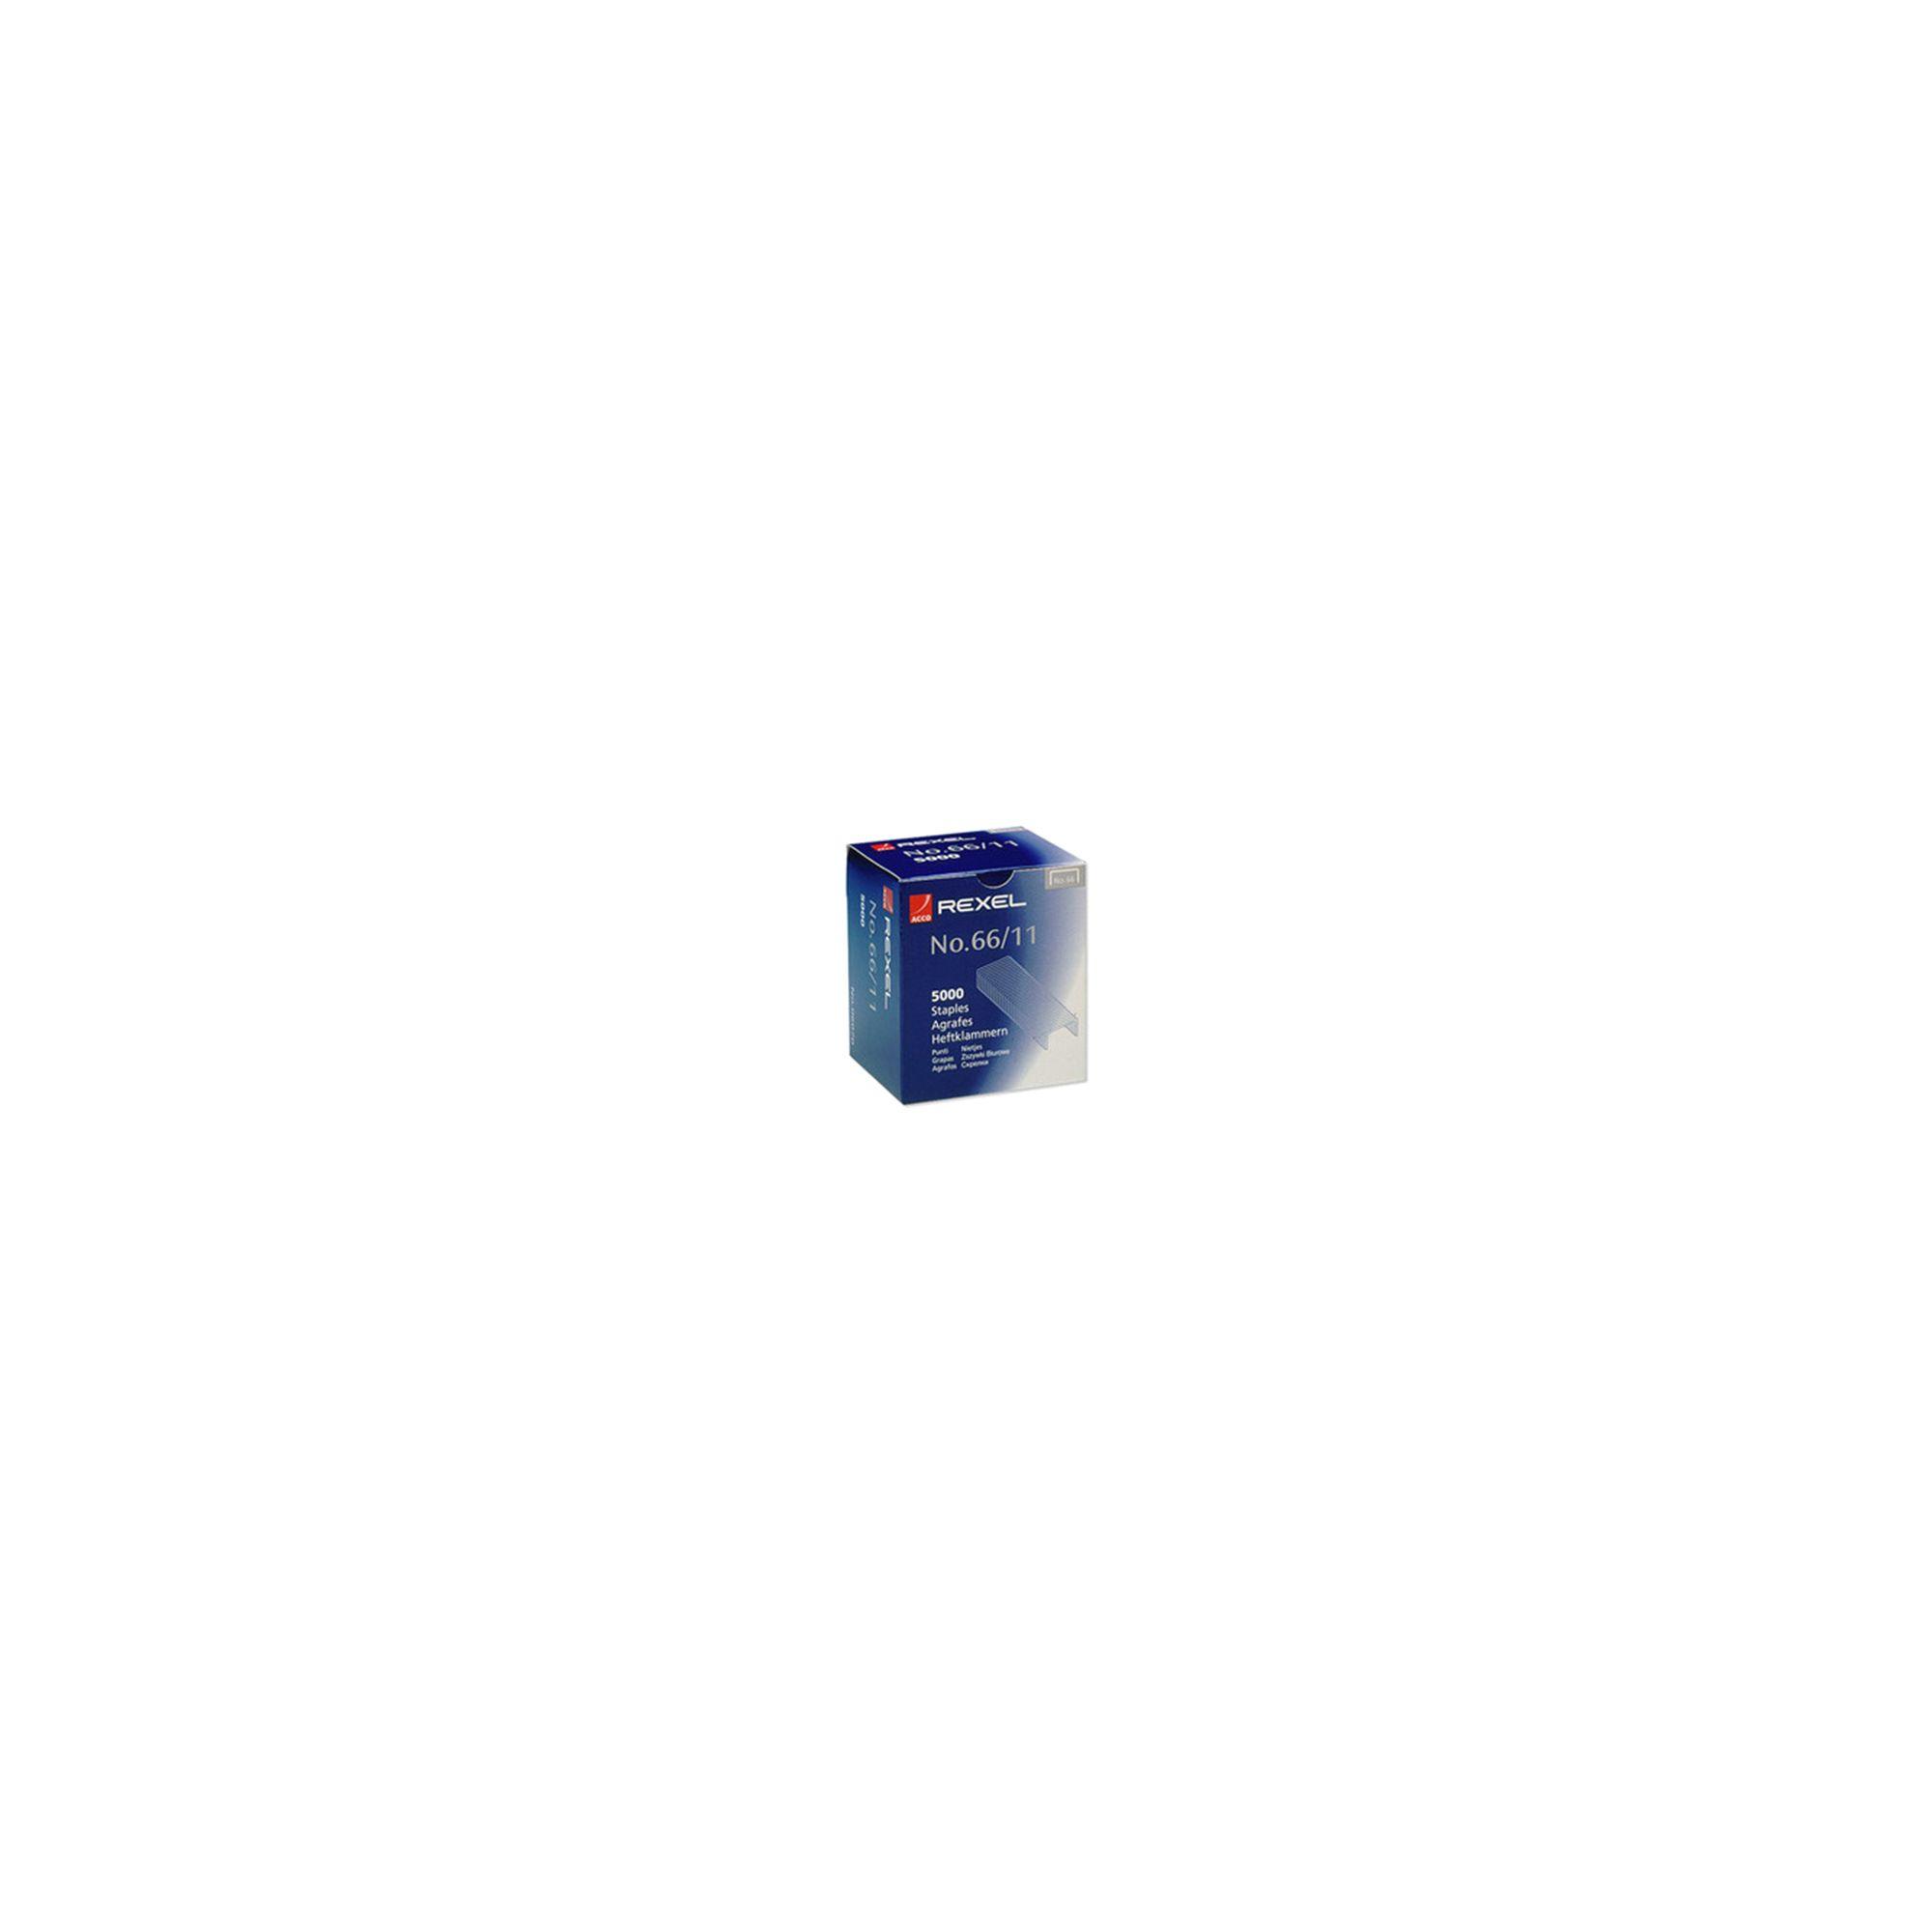 rexel giant stapler no 66 manual